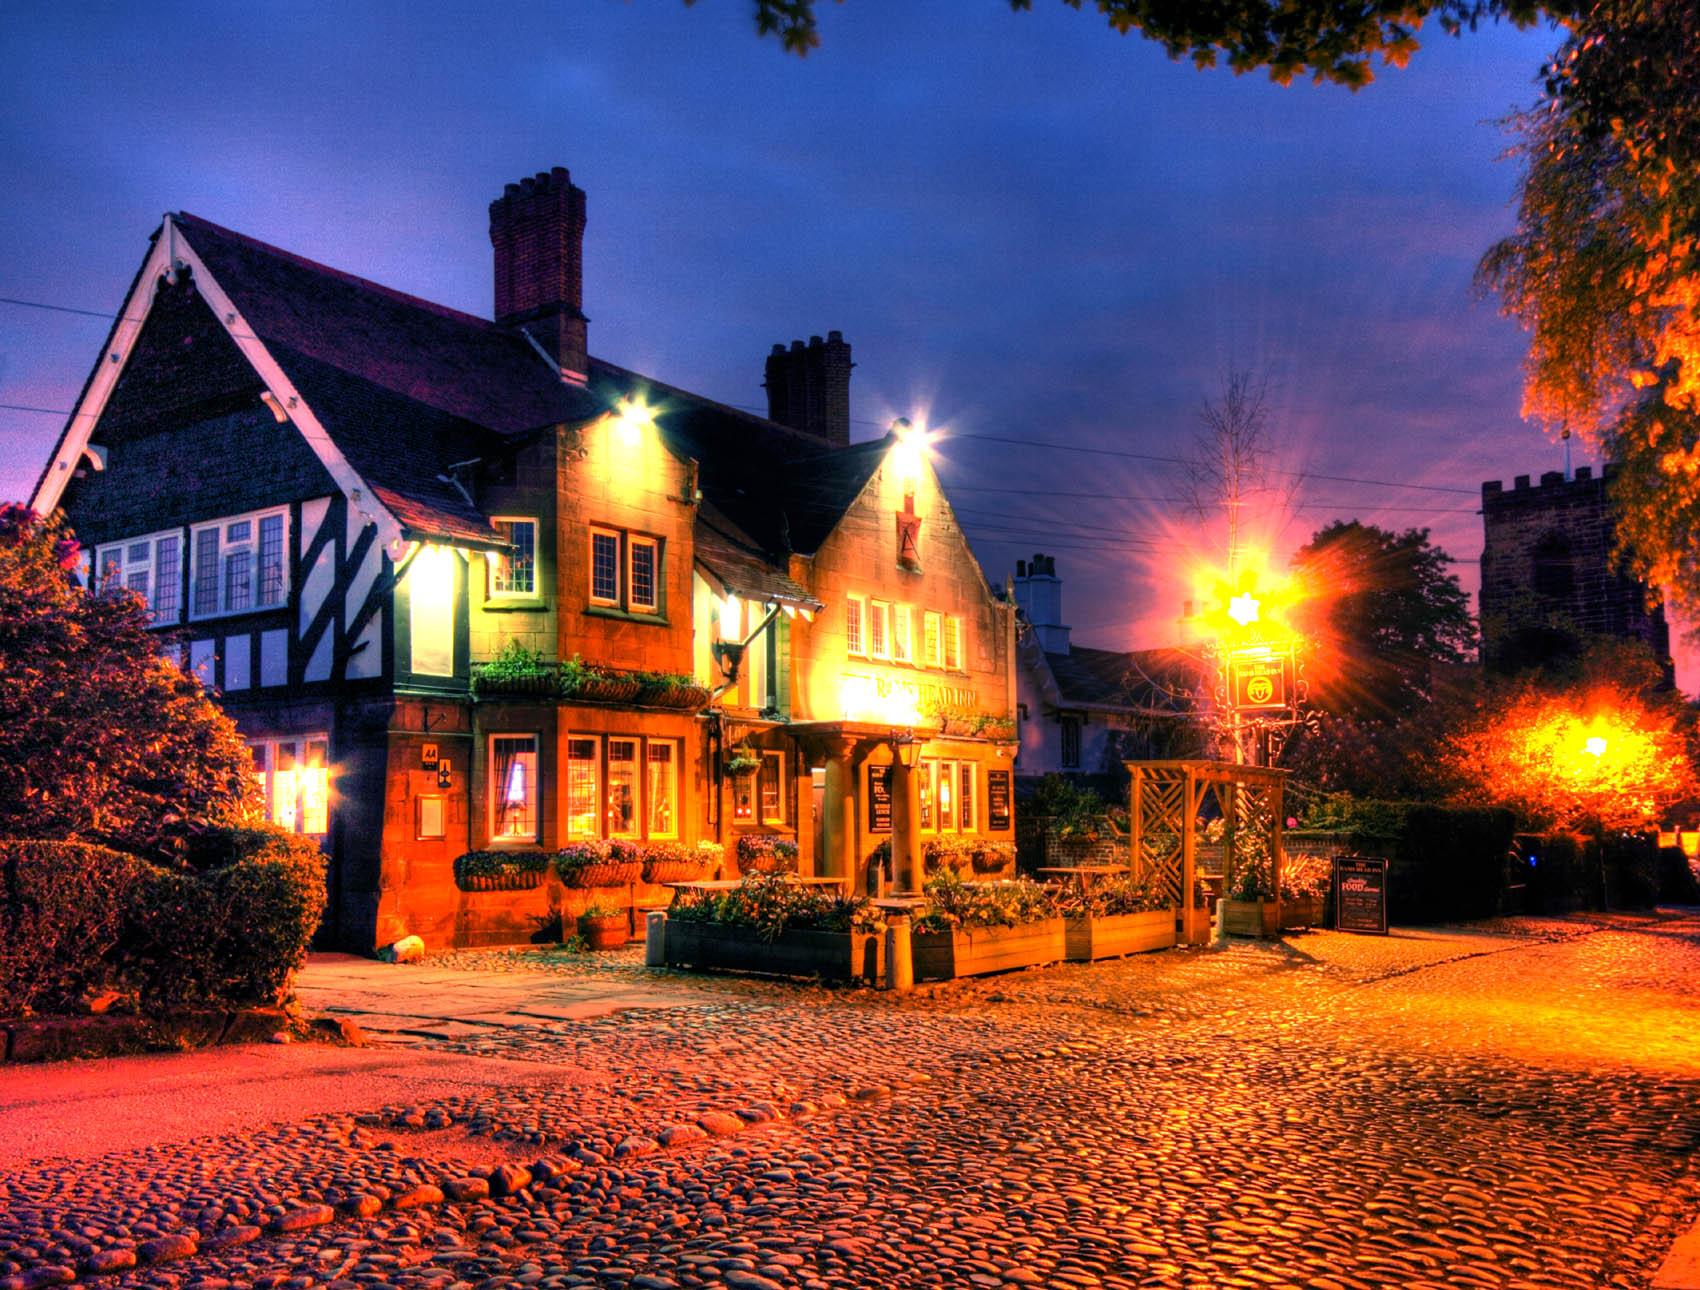 Nightshot Rams Head Grappenhall,Cheshire at Night nightshot Warrington Grappenhall,cheshire,grappenhall,village,rams,head,pub,ceshire,uk,englad,church,lane,cobbles,cobbled,dusk,night,shot,tripod,sunset,food,drink,beer,garden,trees,Grappenhall Village,England,Warrington,A50,A56,tonysmith,tony,smith,hotpics,hotpic,hotpick,hotpicks,hot,pics,pix,picks,hotpix.freeserve.co.uk,favourite,pubs,public,houses,noche,nuit,hotpix!,#HotpixUK,#TonySmithHotpix,dblringexcellence,inn,house